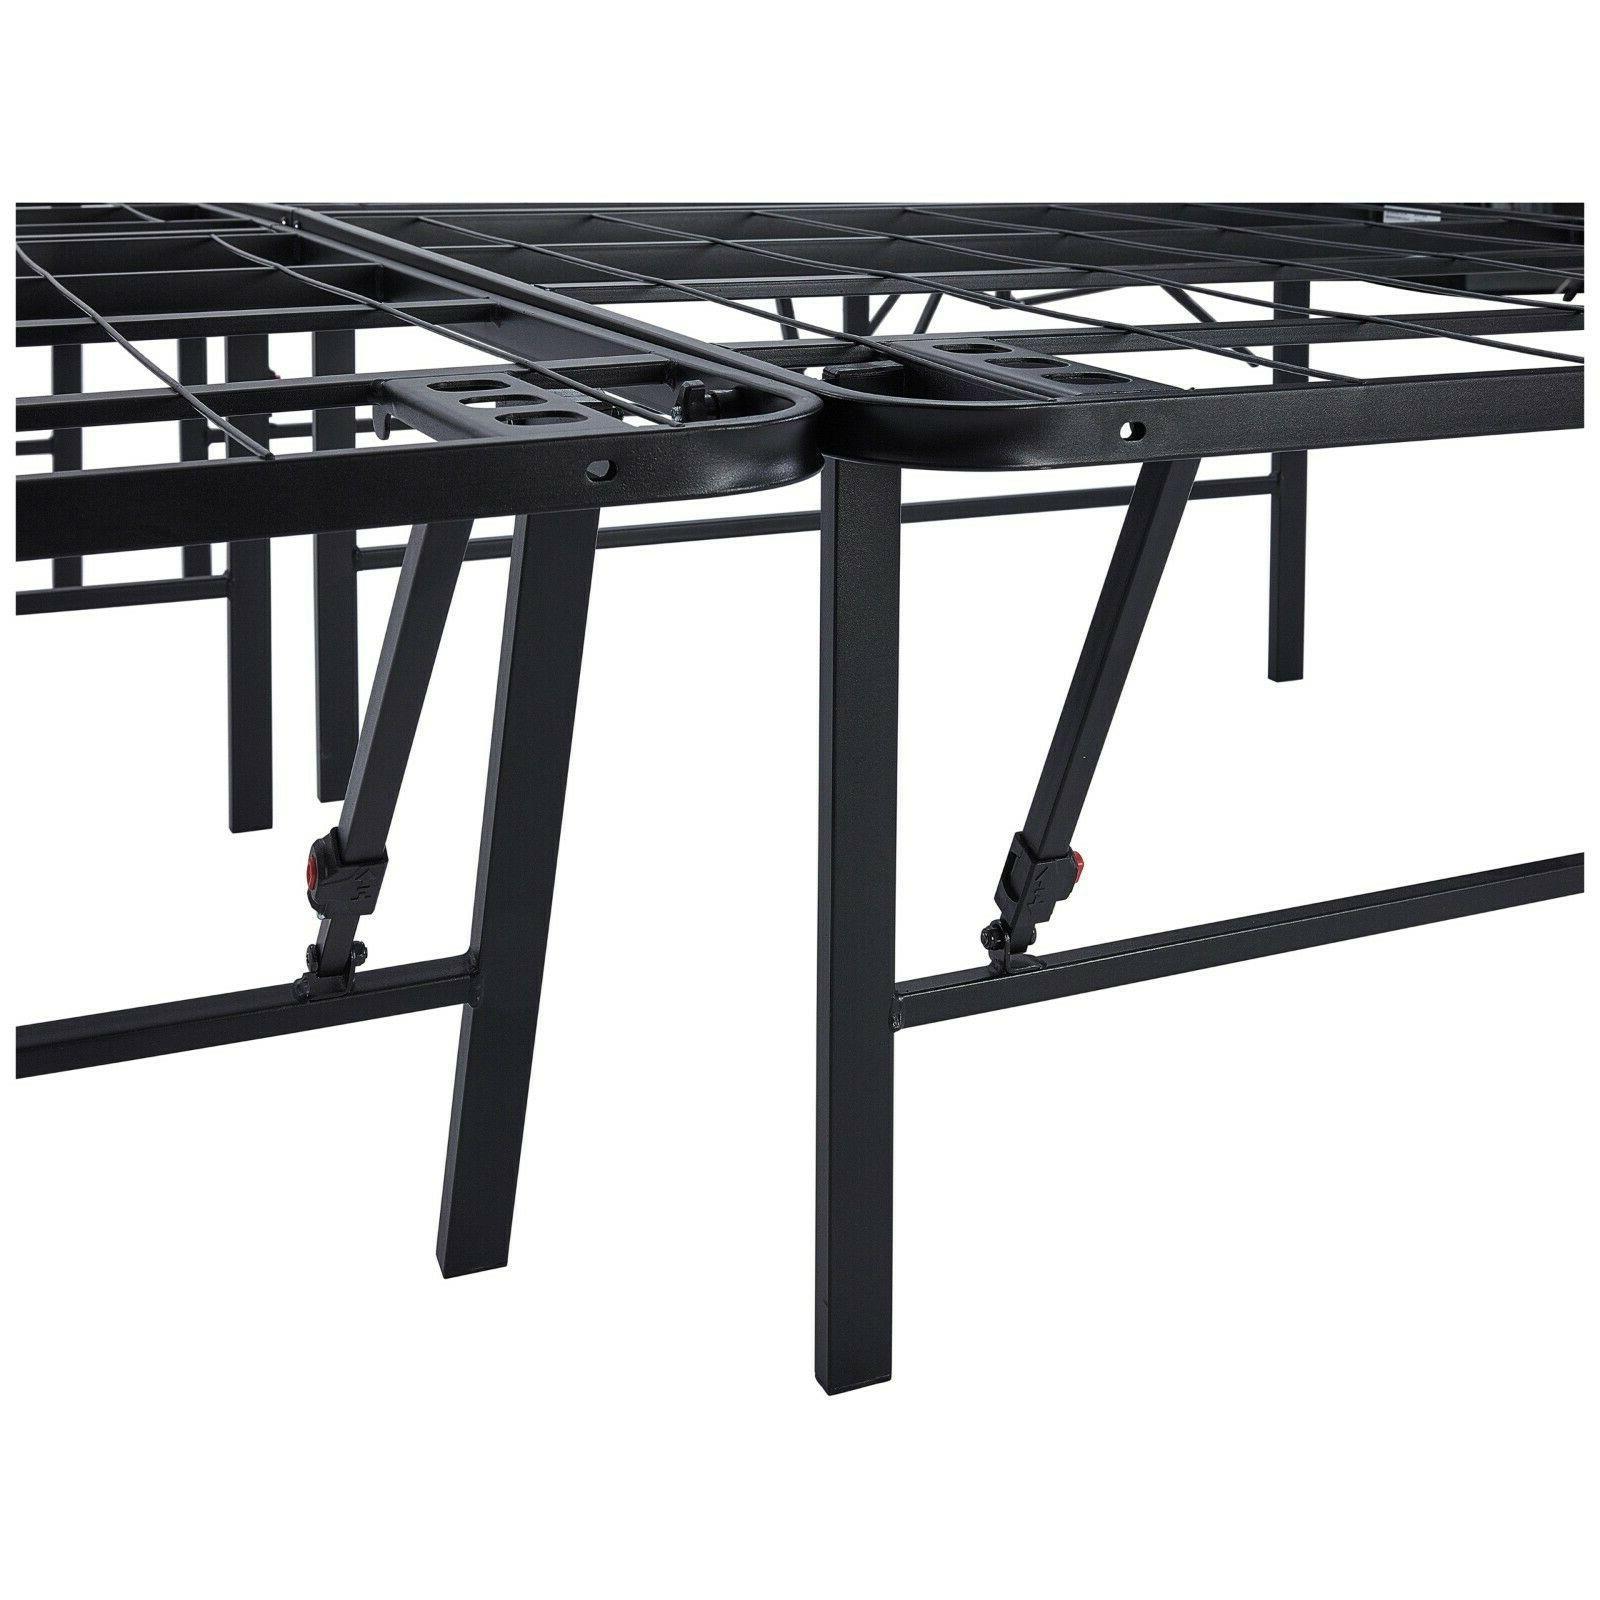 Metal Frame Foldable Platform - 18 King Full